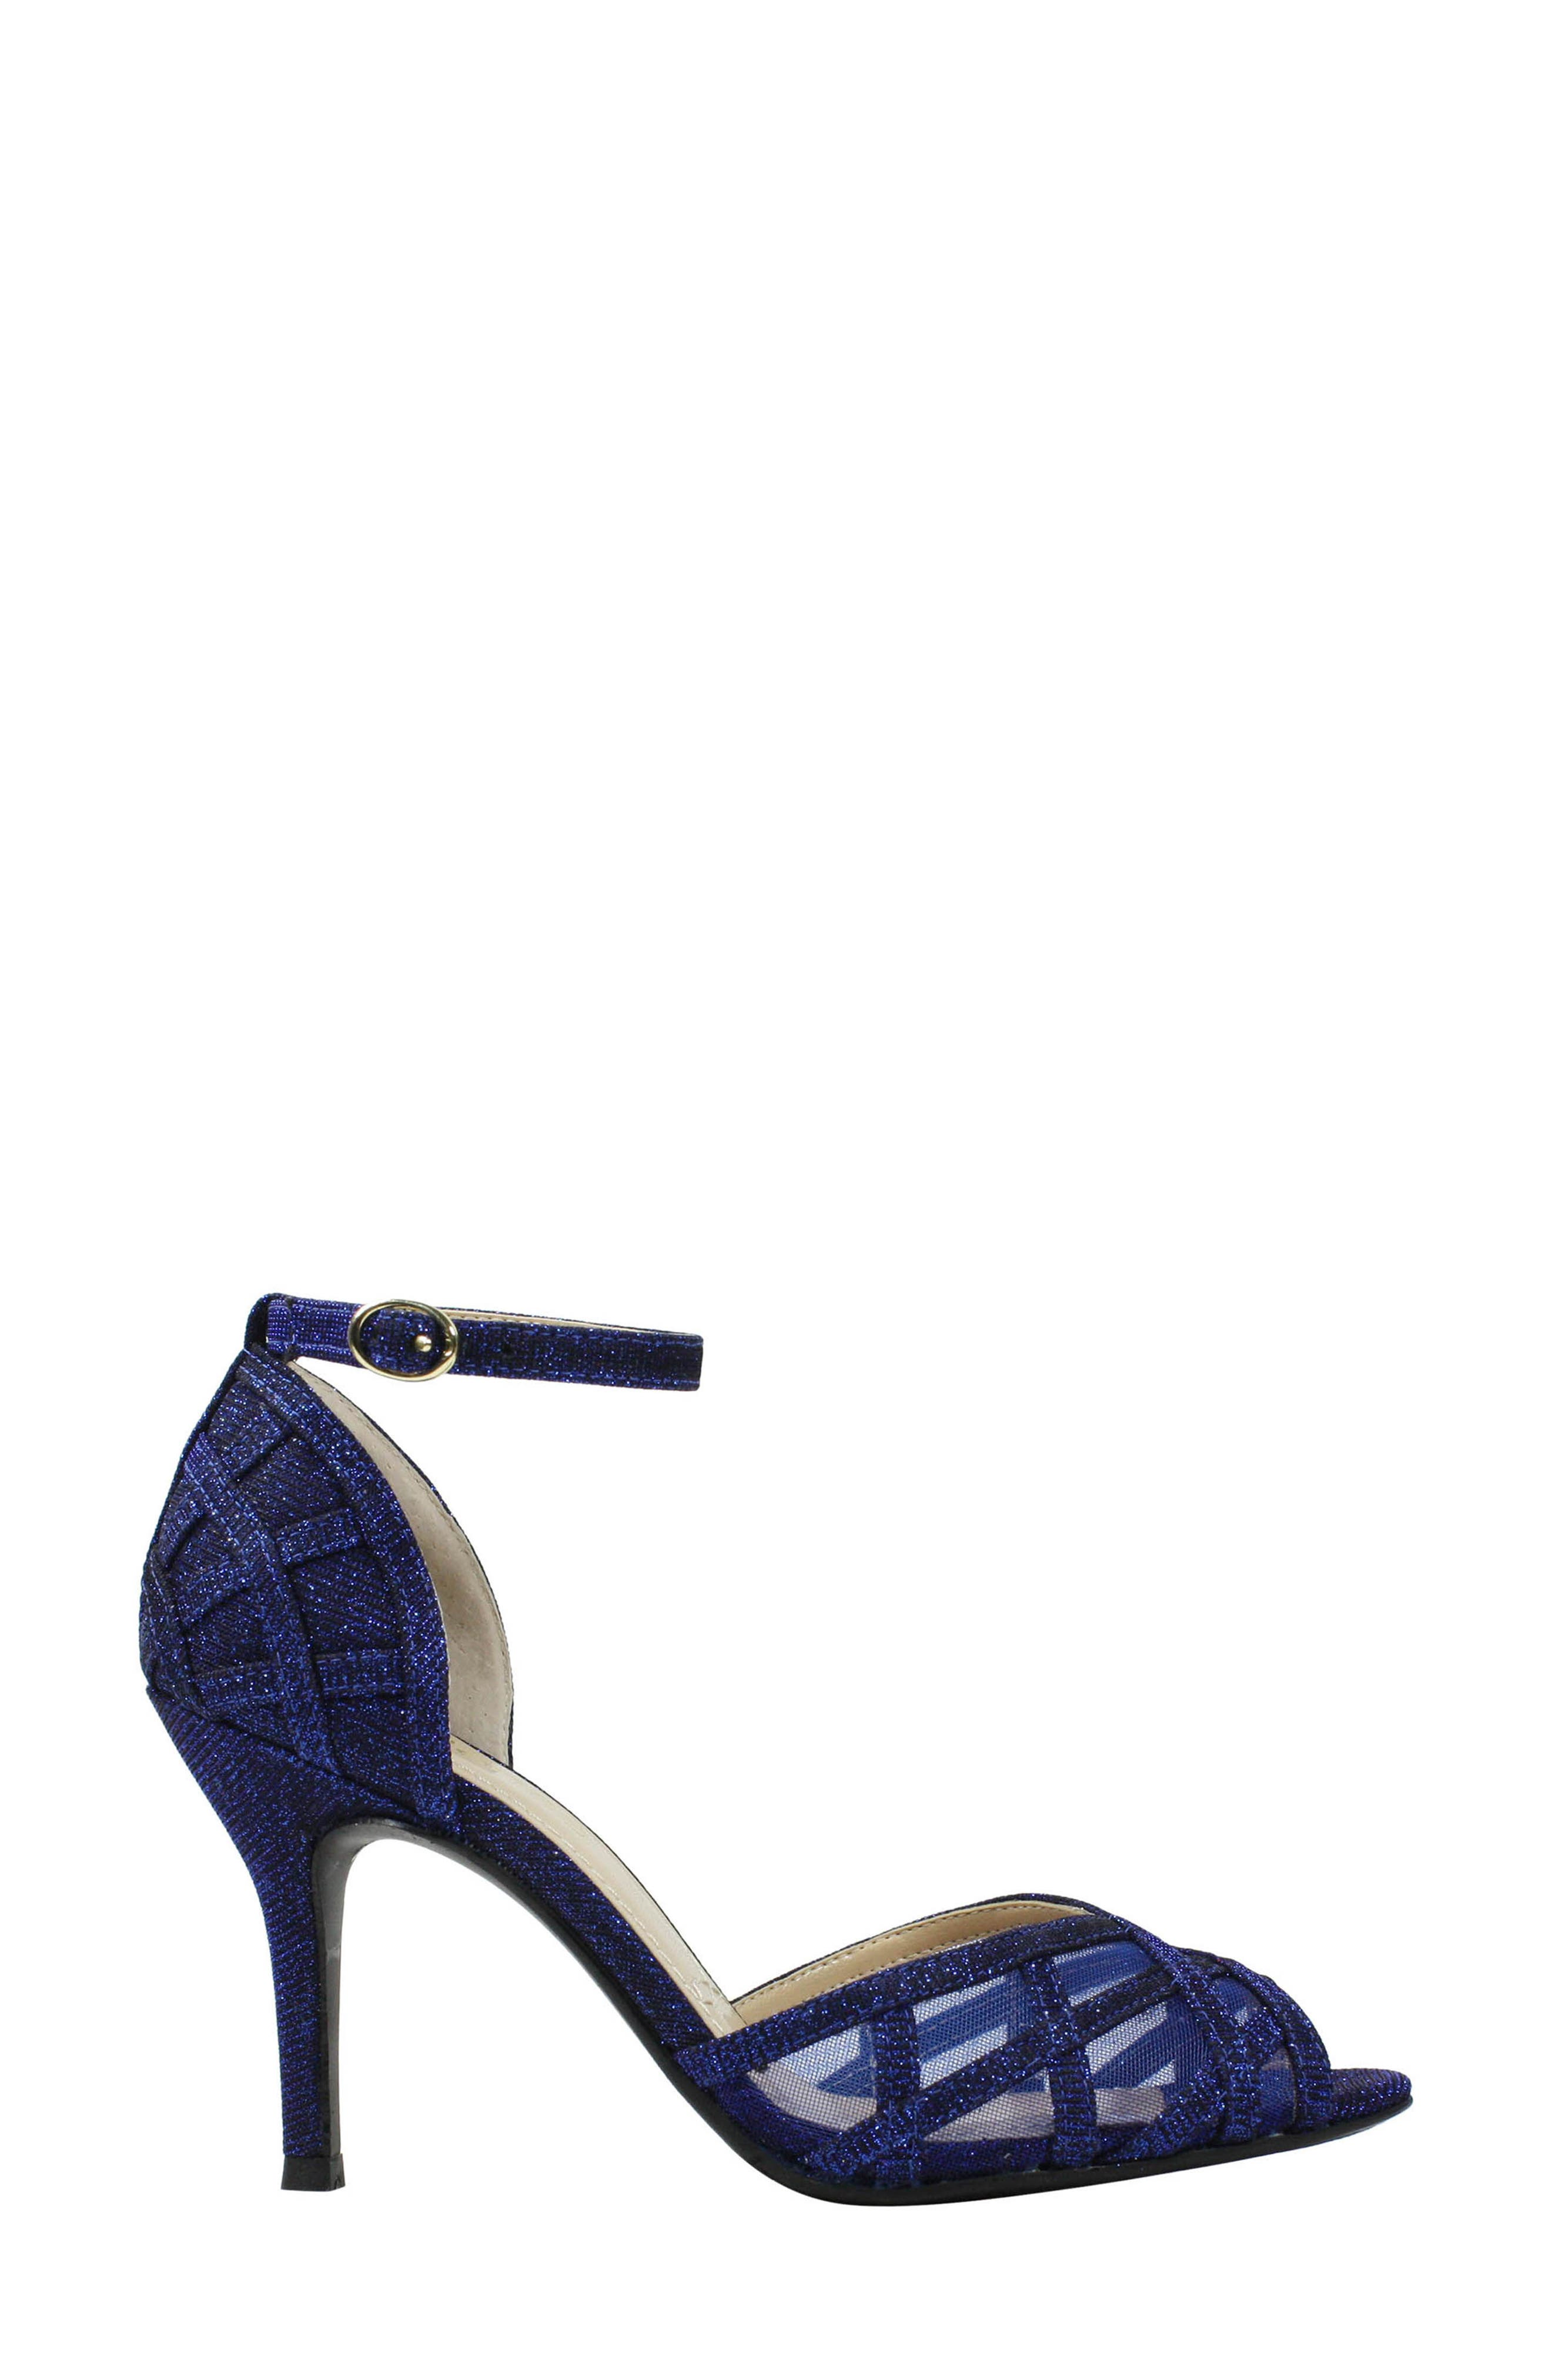 Alternate Image 3  - J. Reneé Mataro Embellished Ankle Strap Pump (Women)